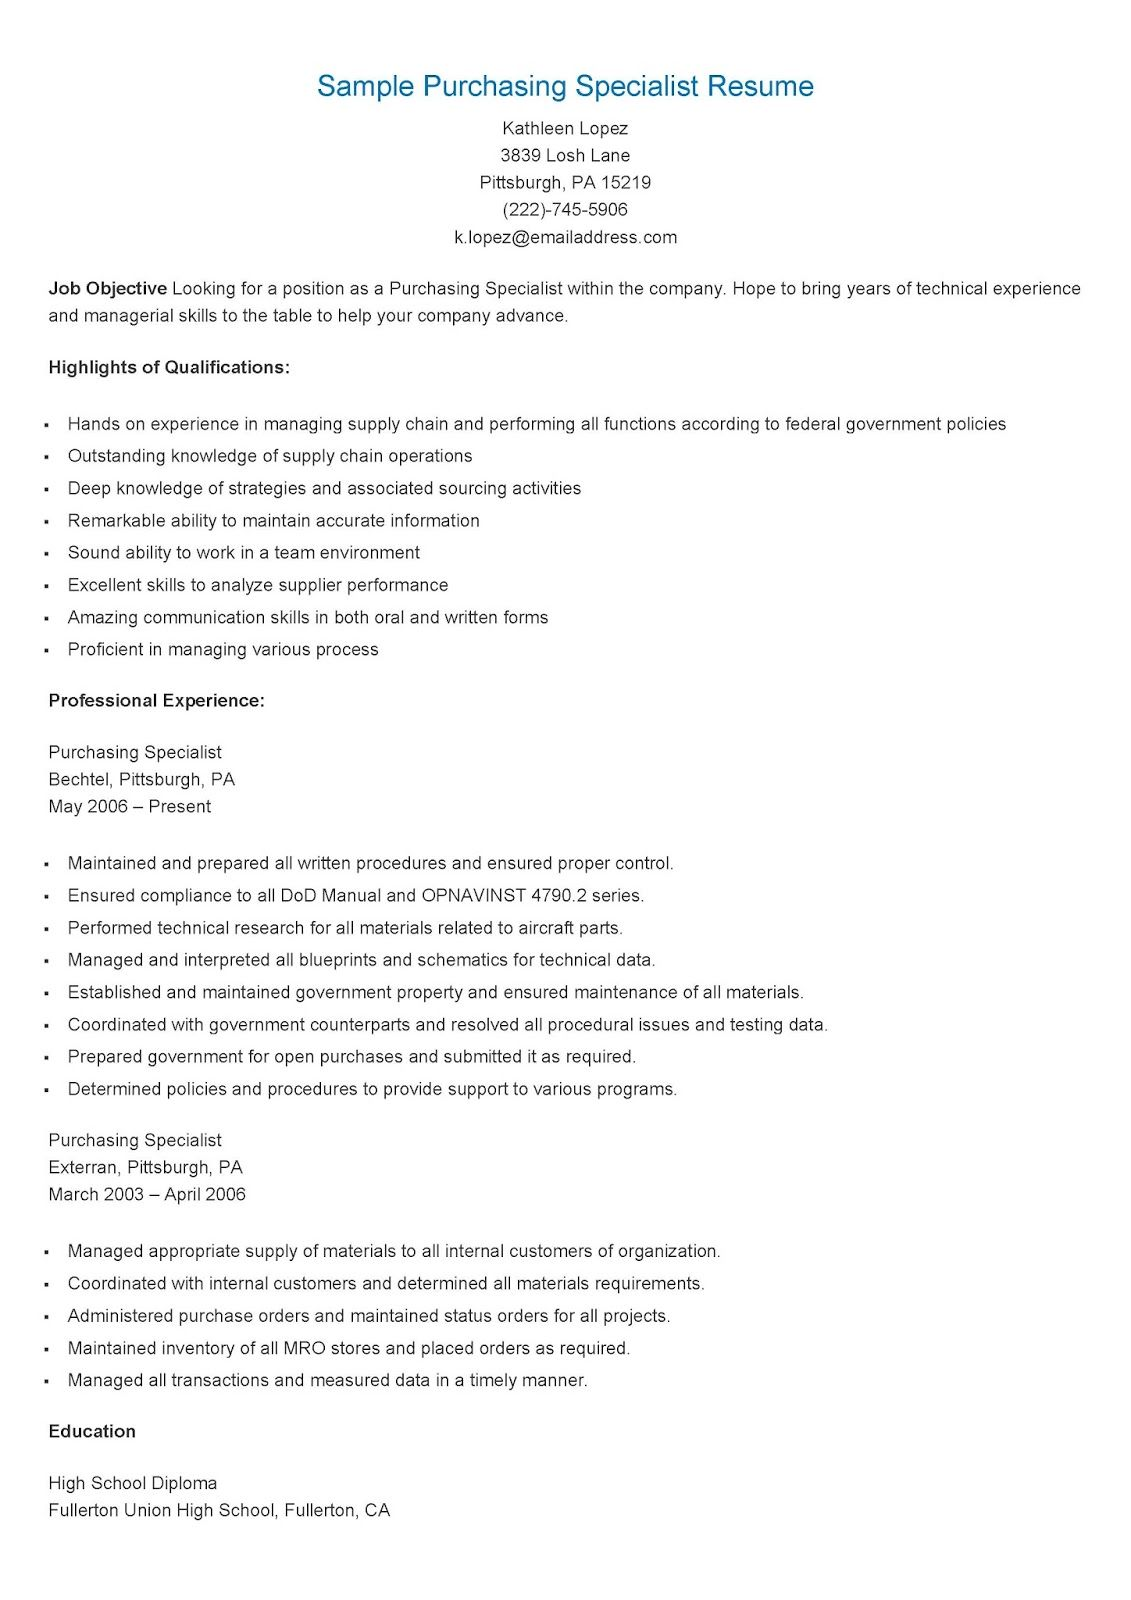 Sample Purchasing Specialist Resume Resume Job Resume Examples Resume Skills